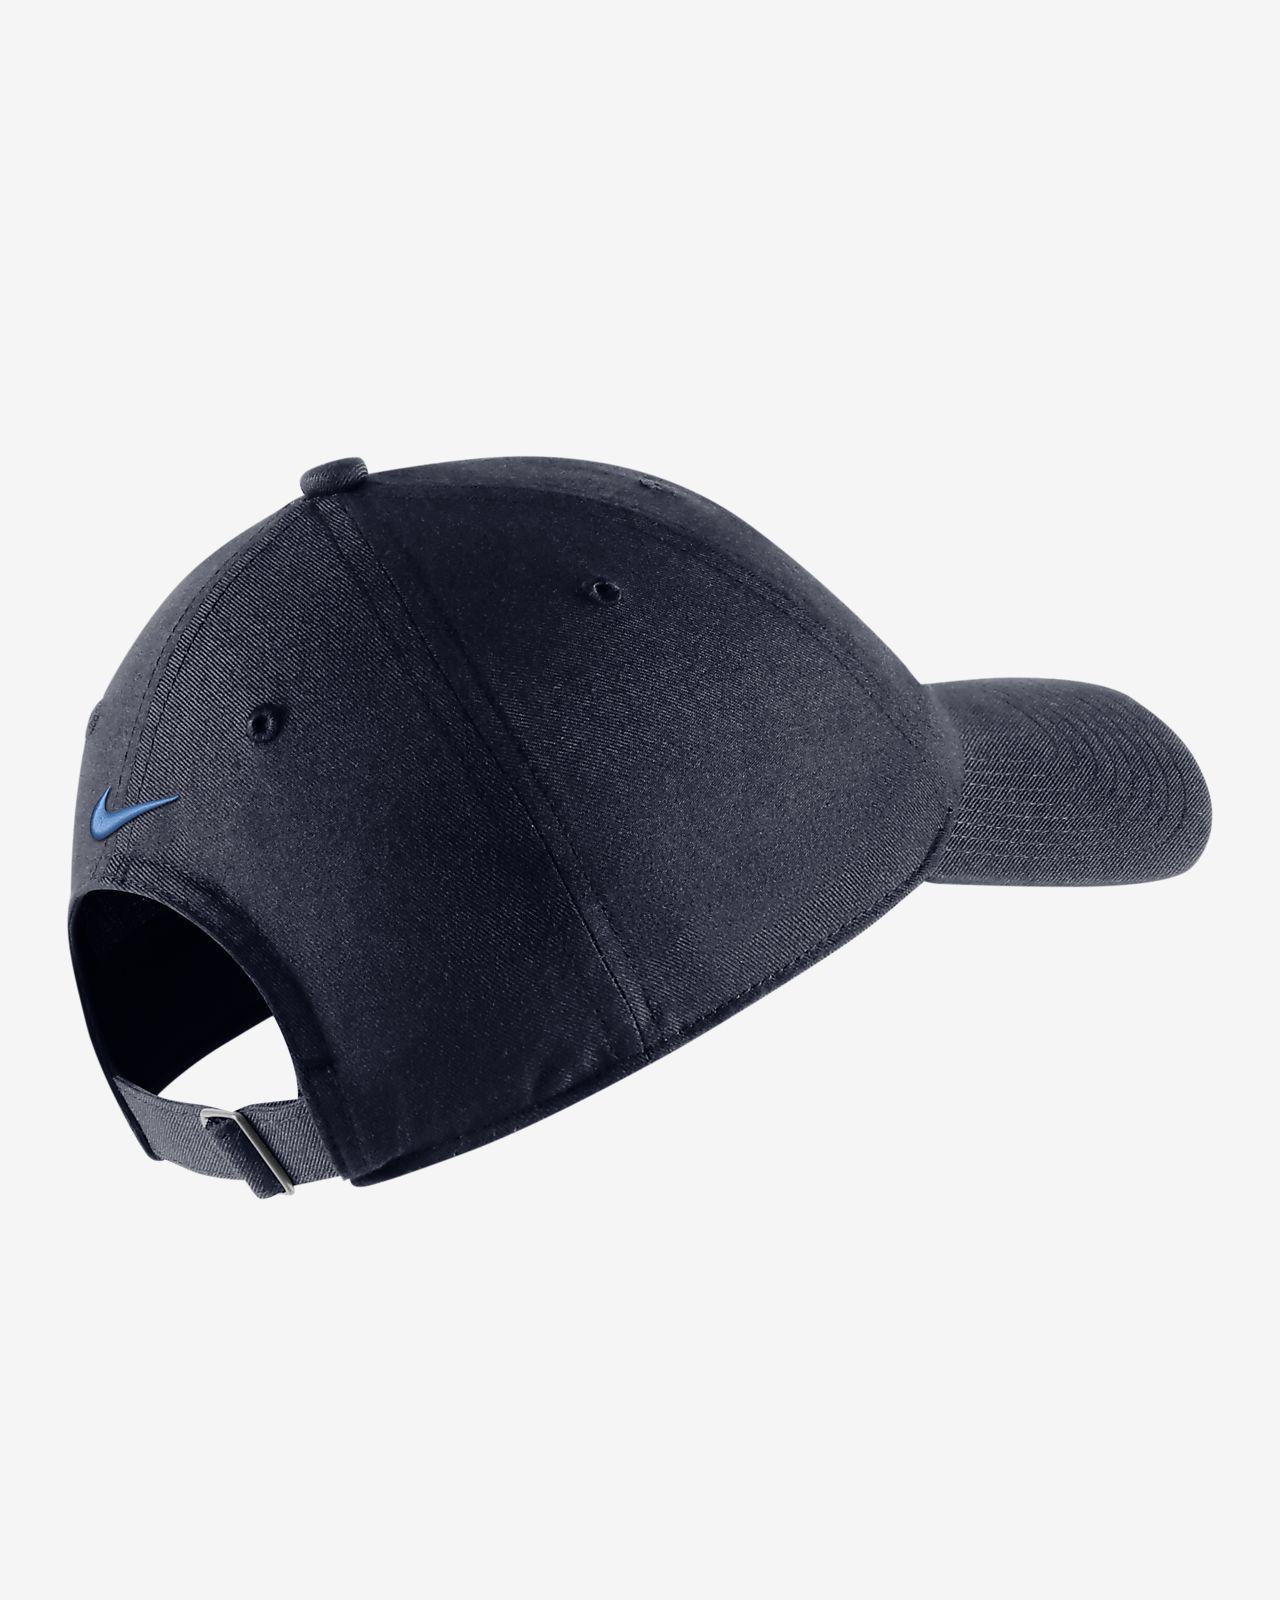 cc518831877c3 Nike Heritage86 (NFL Titans) Adjustable Hat. Nike.com